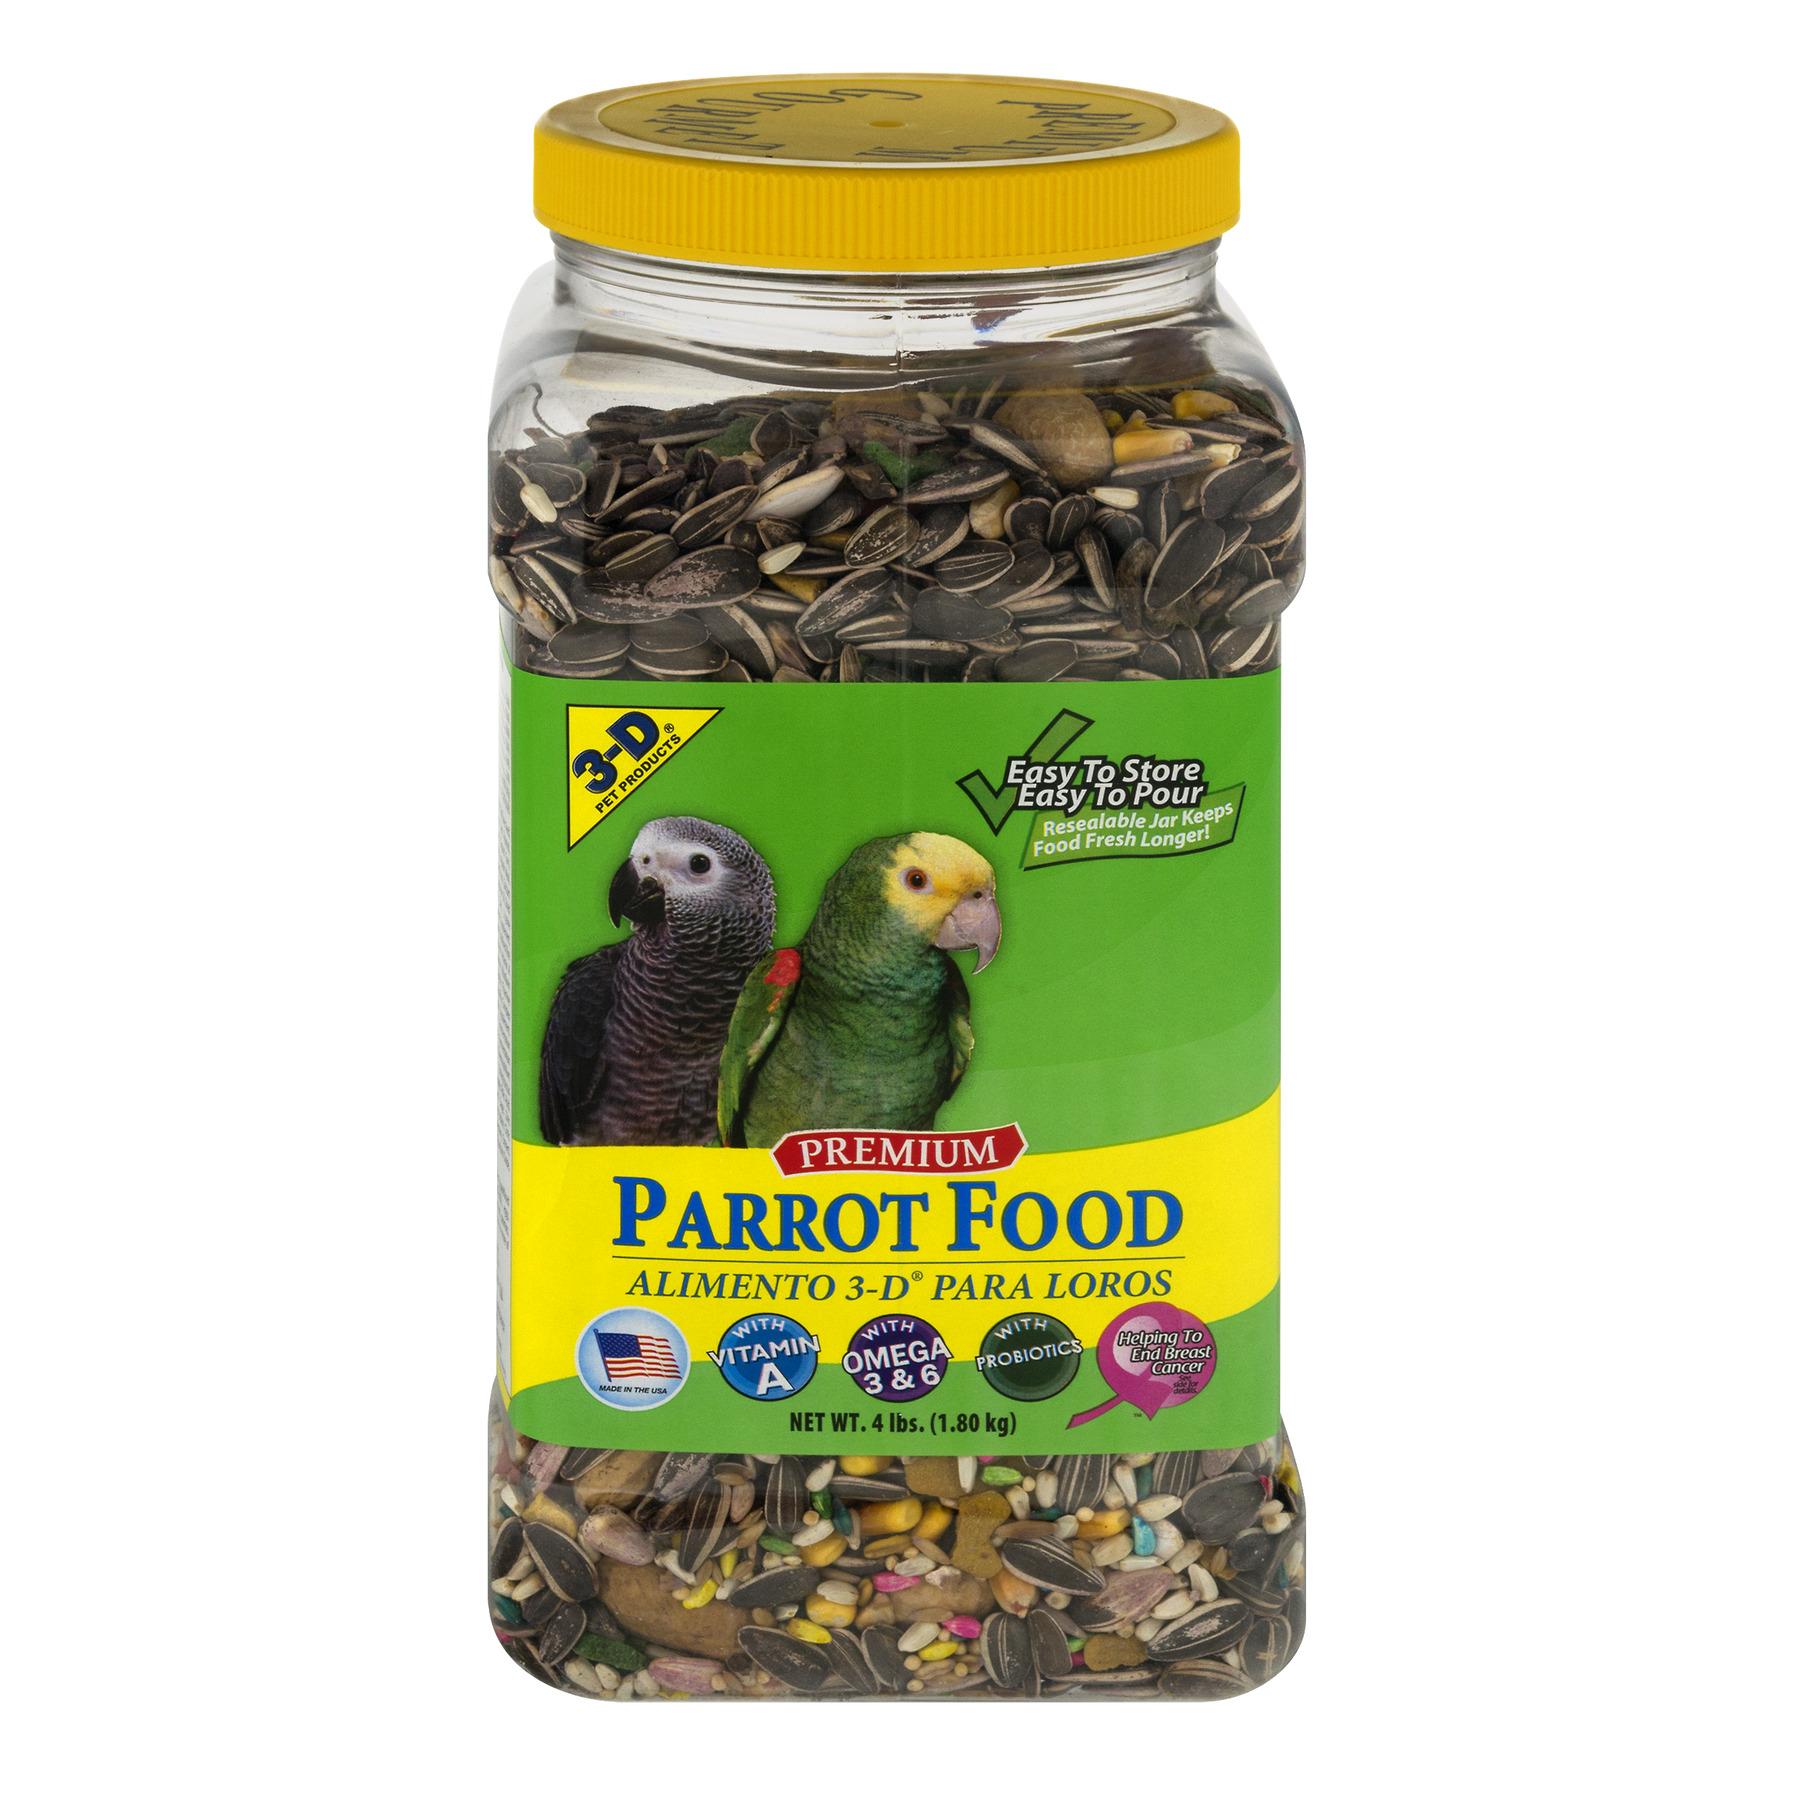 Image of 3-D Premium Parrot Food, 4.0 LB